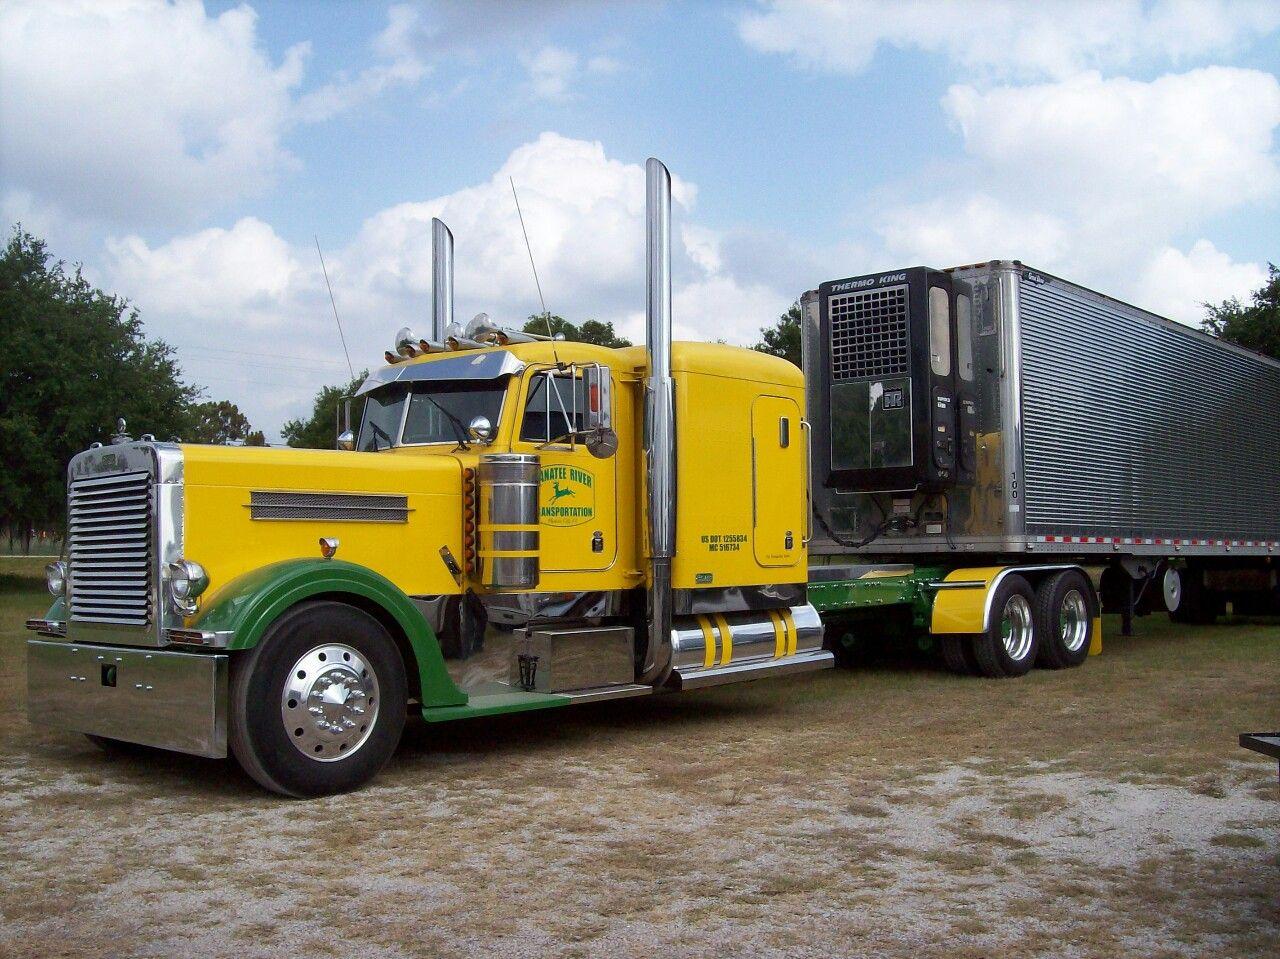 truckingworldwide: 1996 Peterbilt custom 379 EX